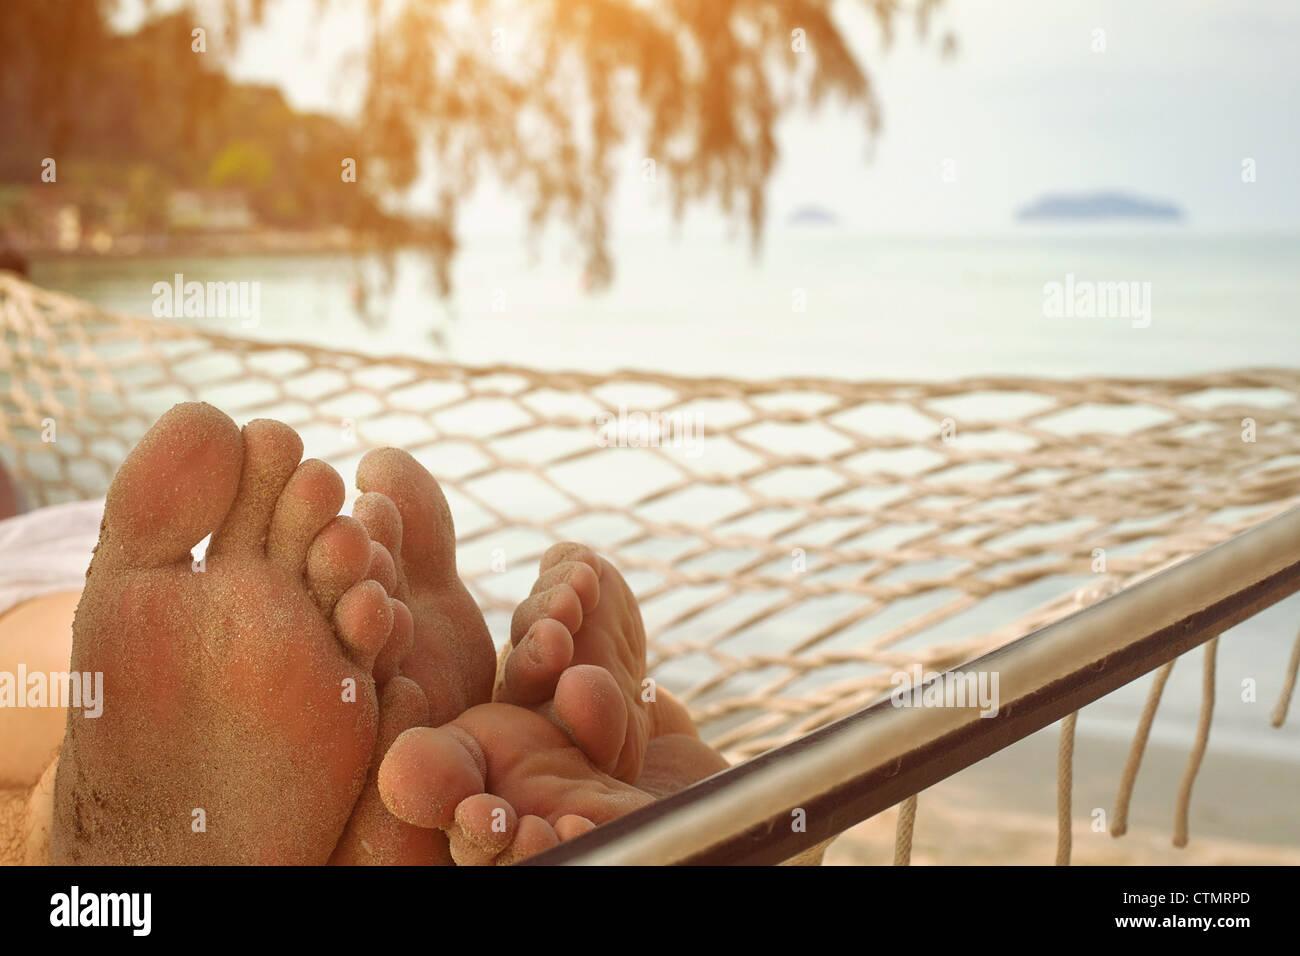 couple n hammock - Stock Image